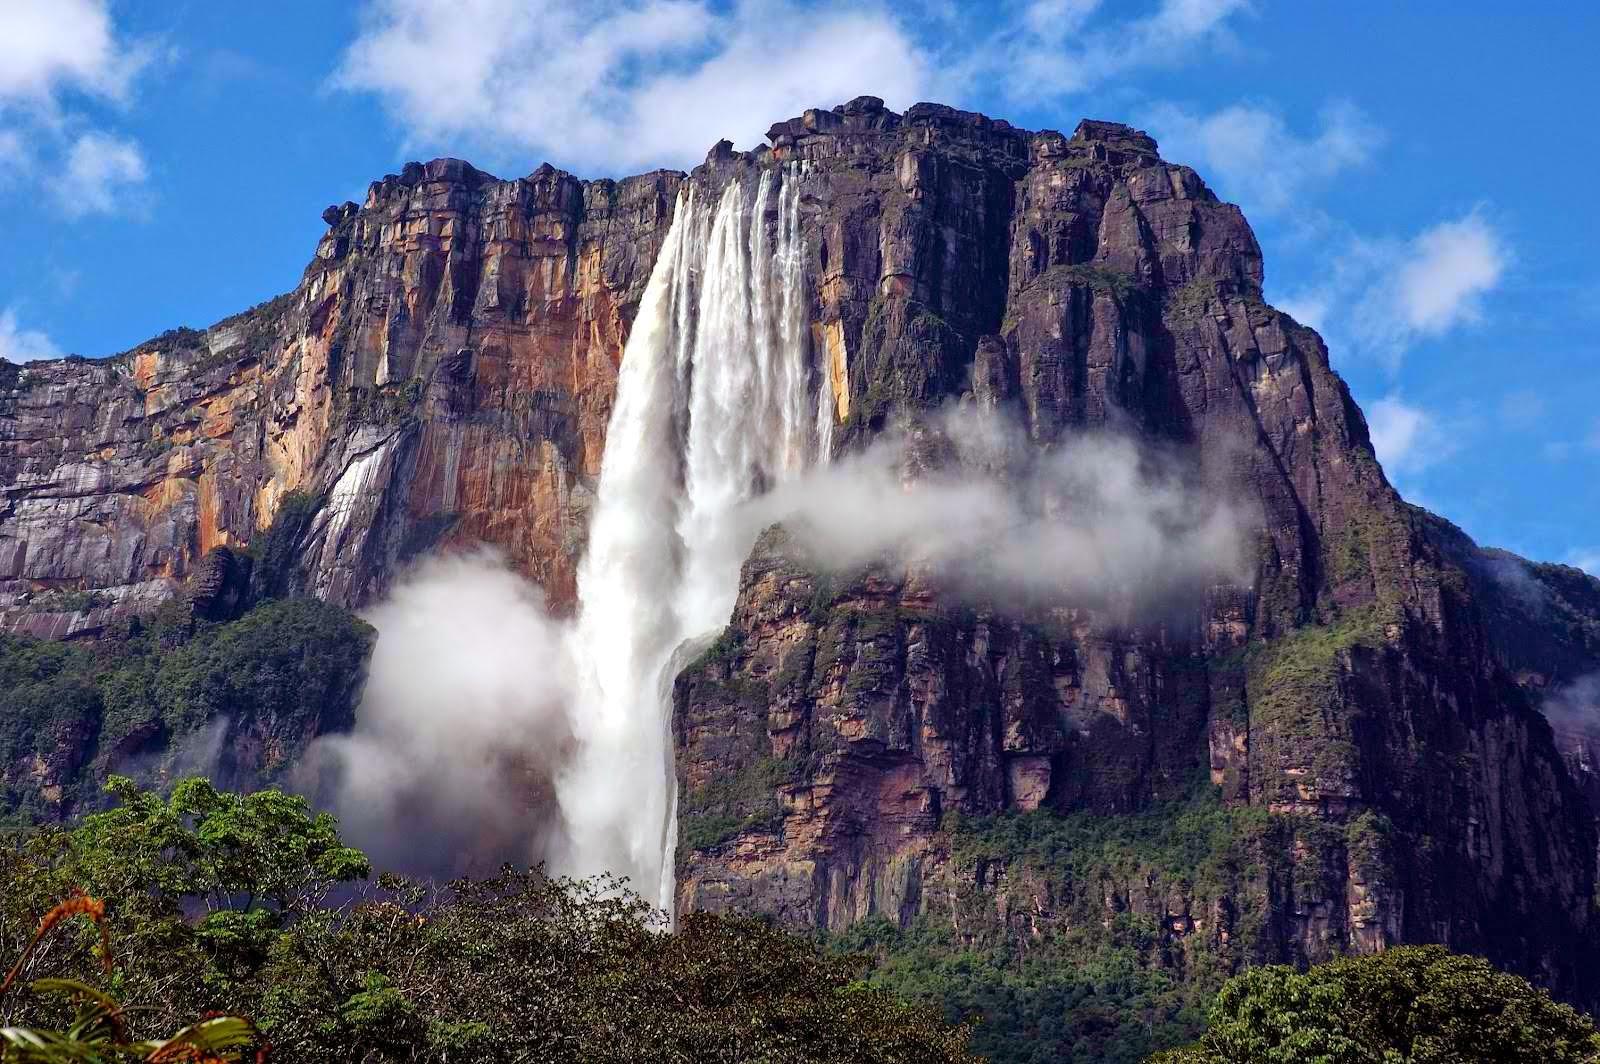 Earth's Highest Waterfall - Angel Falls